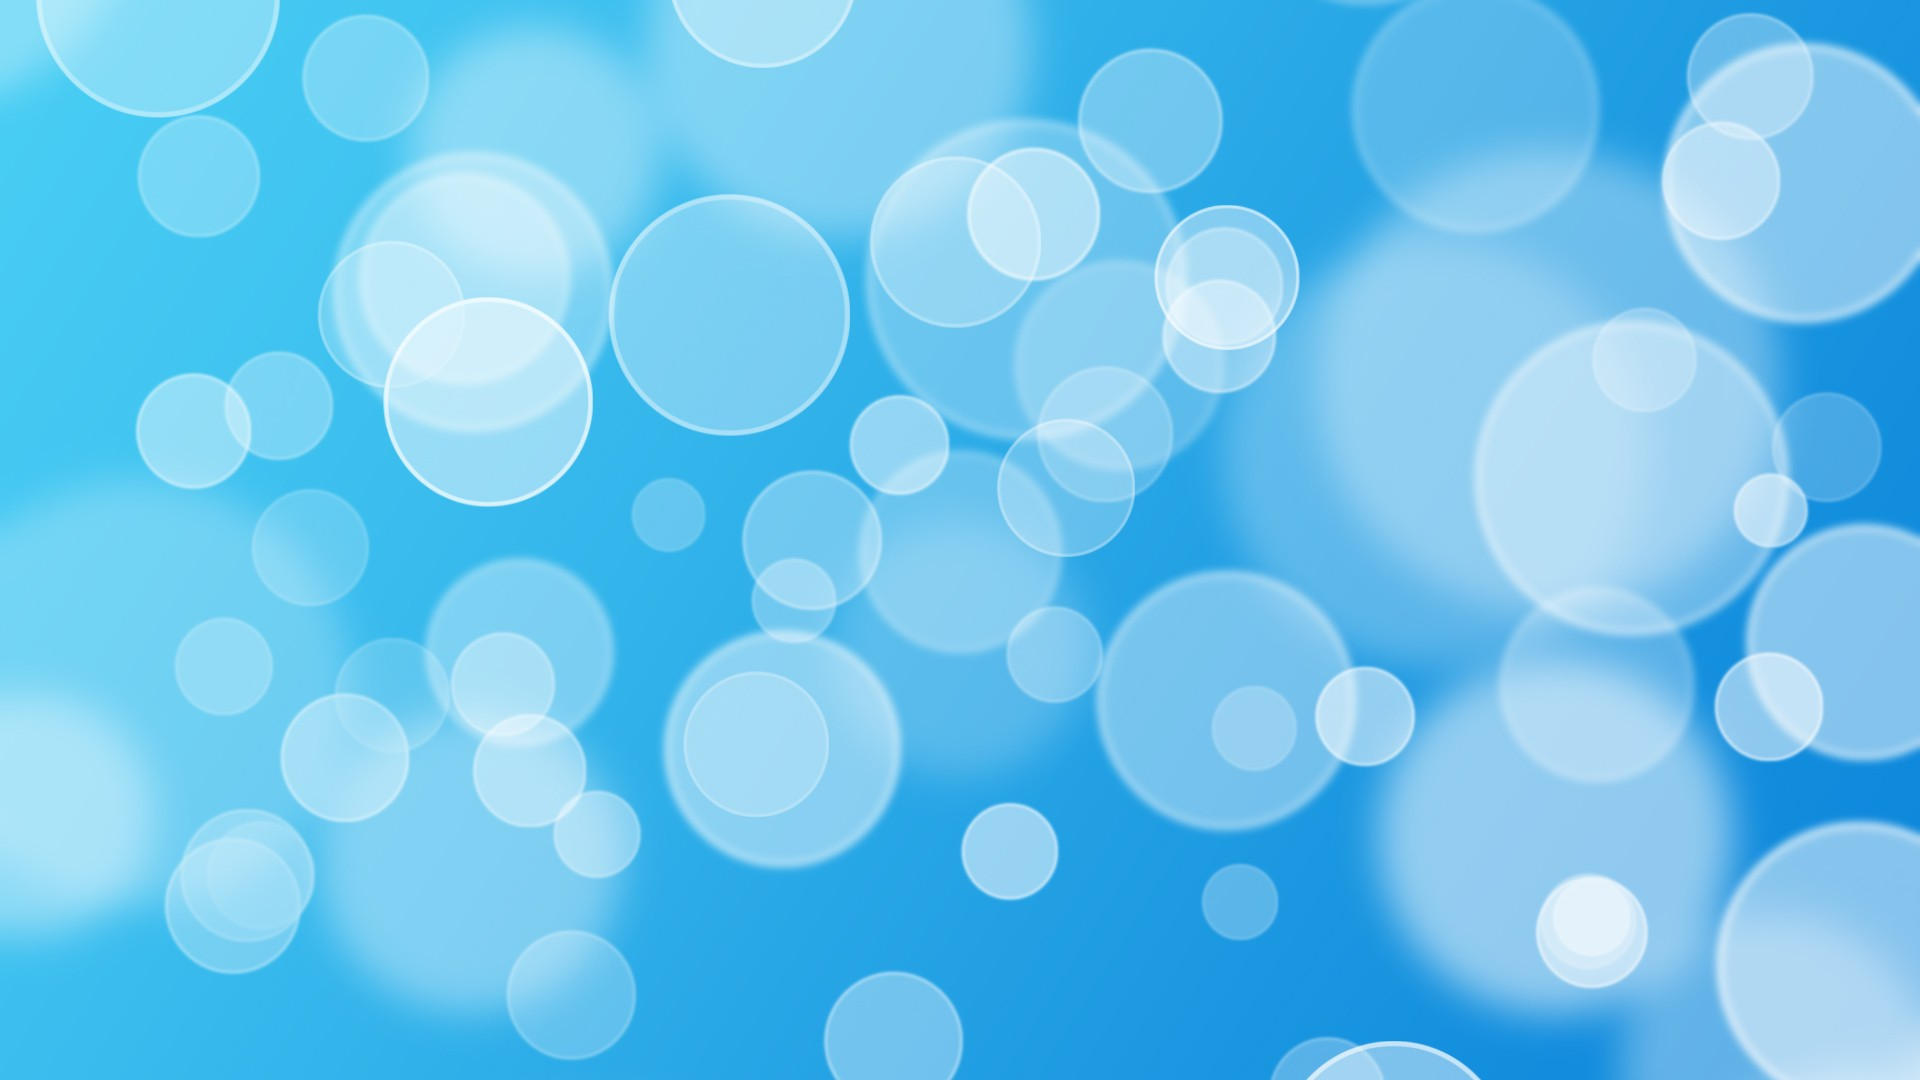 bubble-vector-art-39 Ideas For Blue Vector Art Background @koolgadgetz.com.info